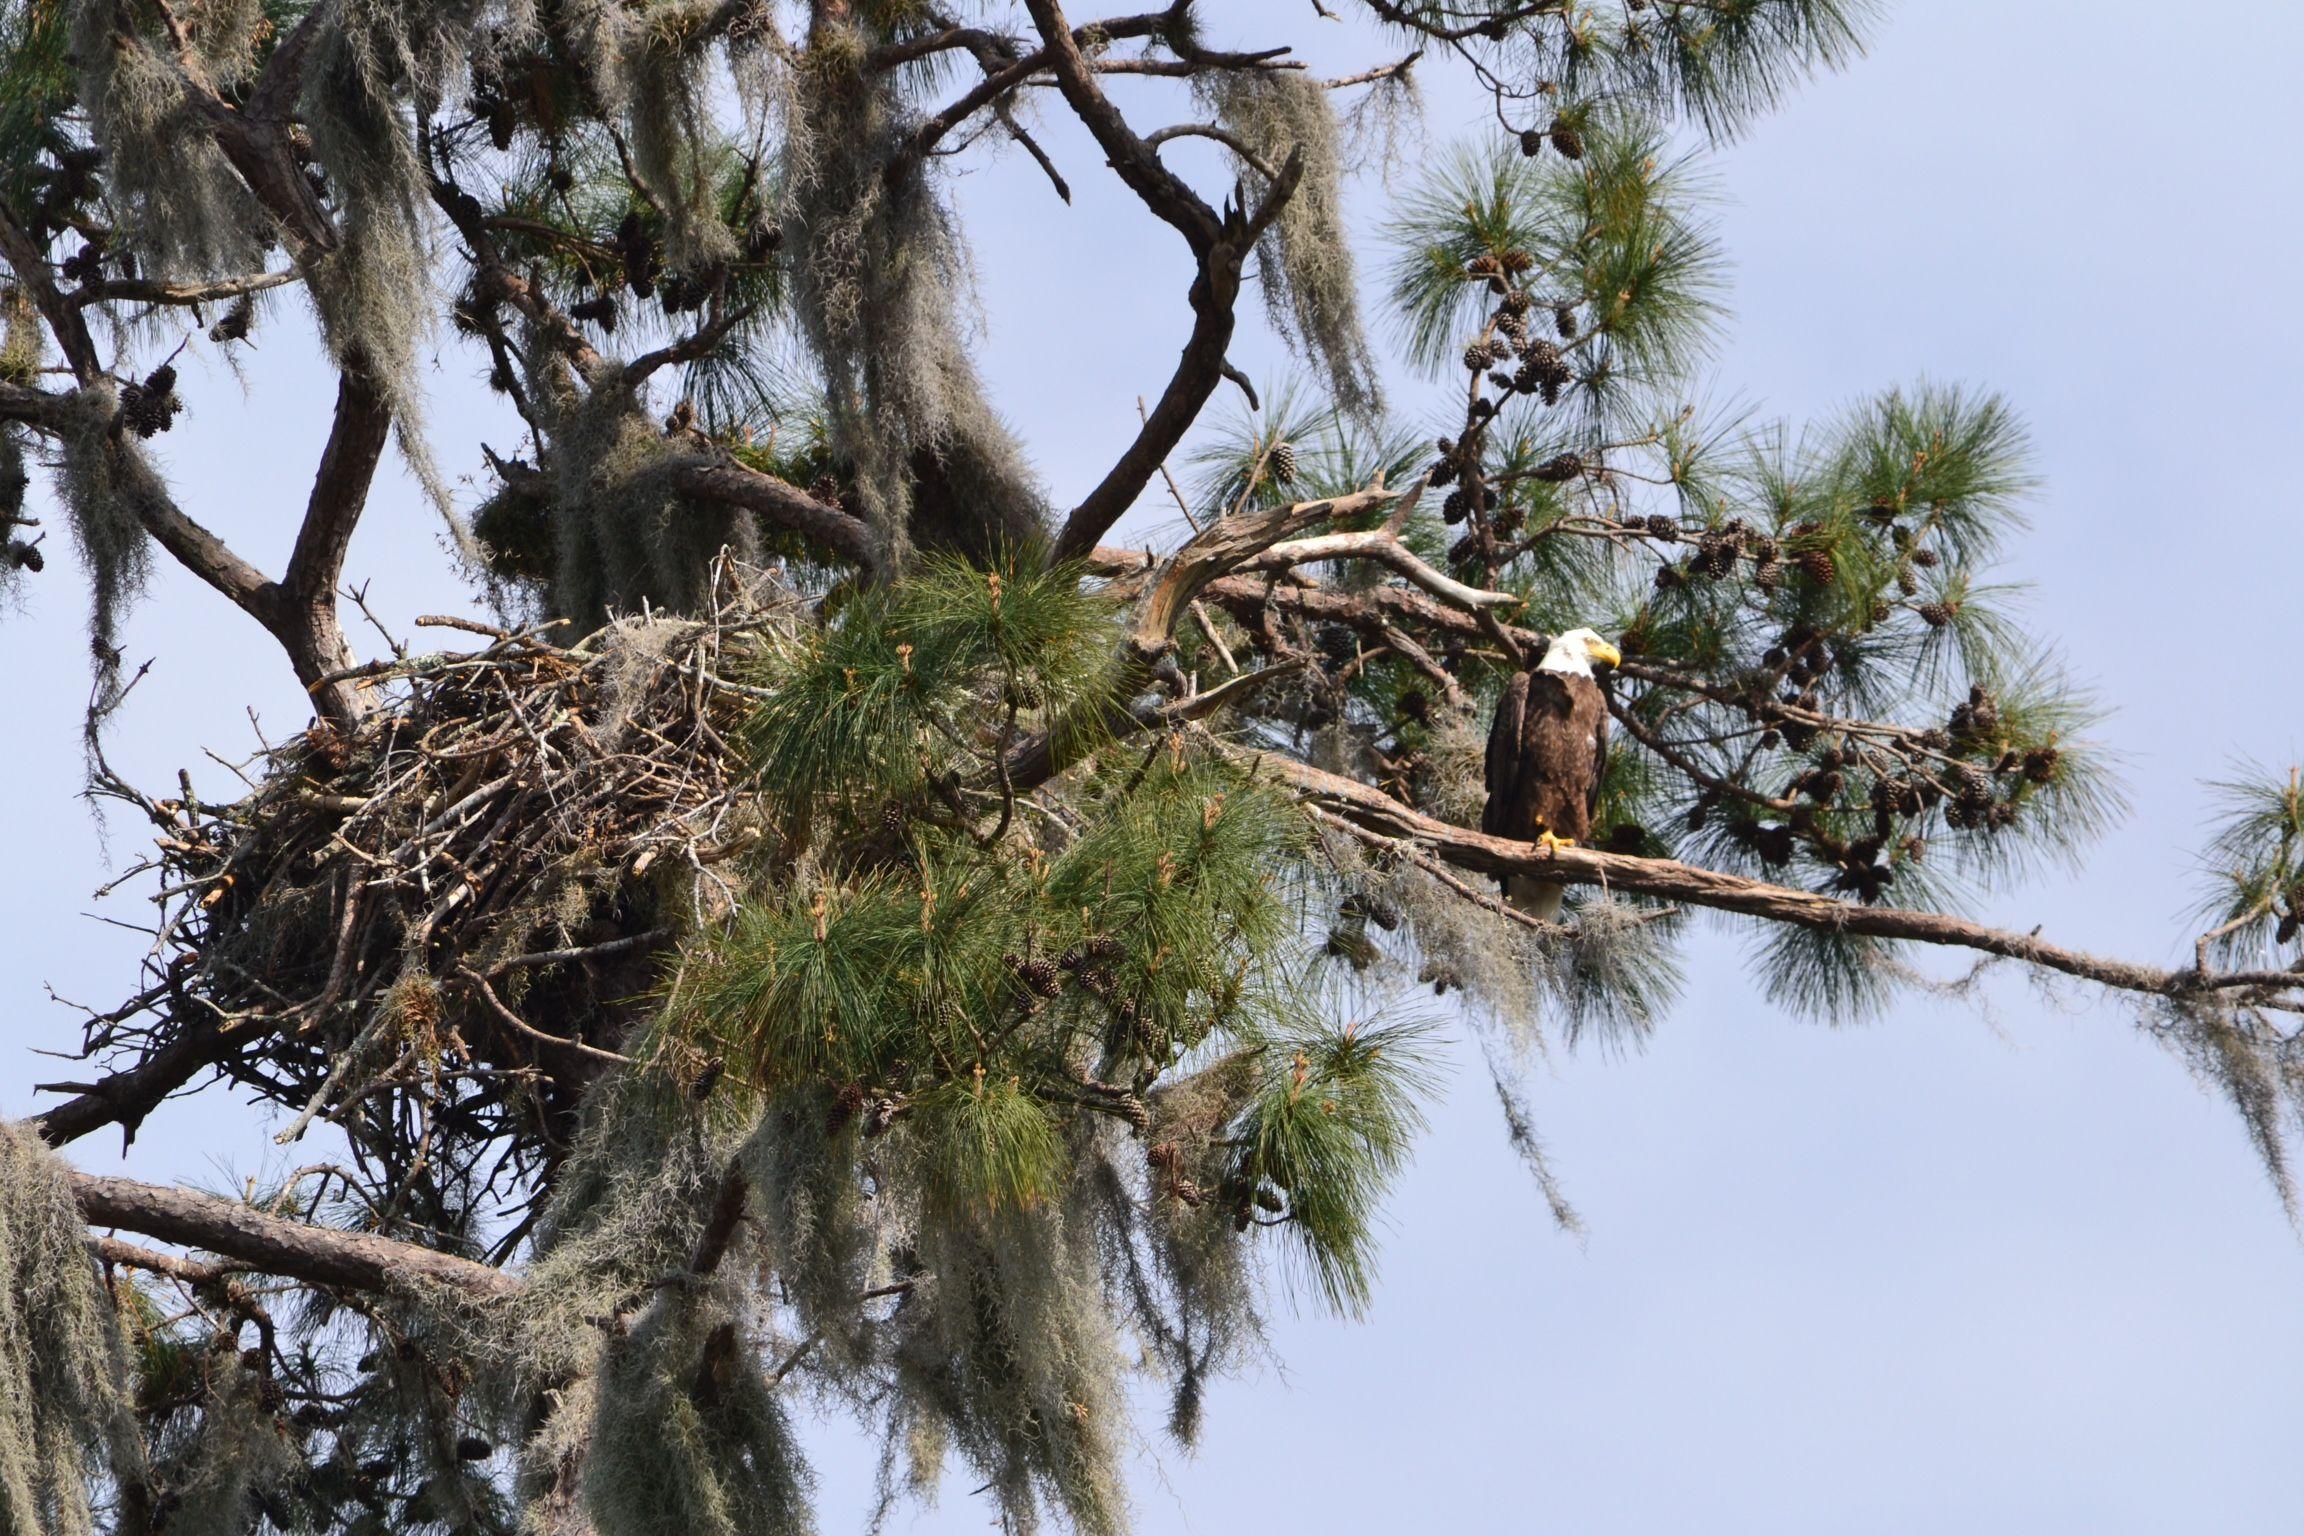 Bald eagle with nest fish camp national wildlife refuge